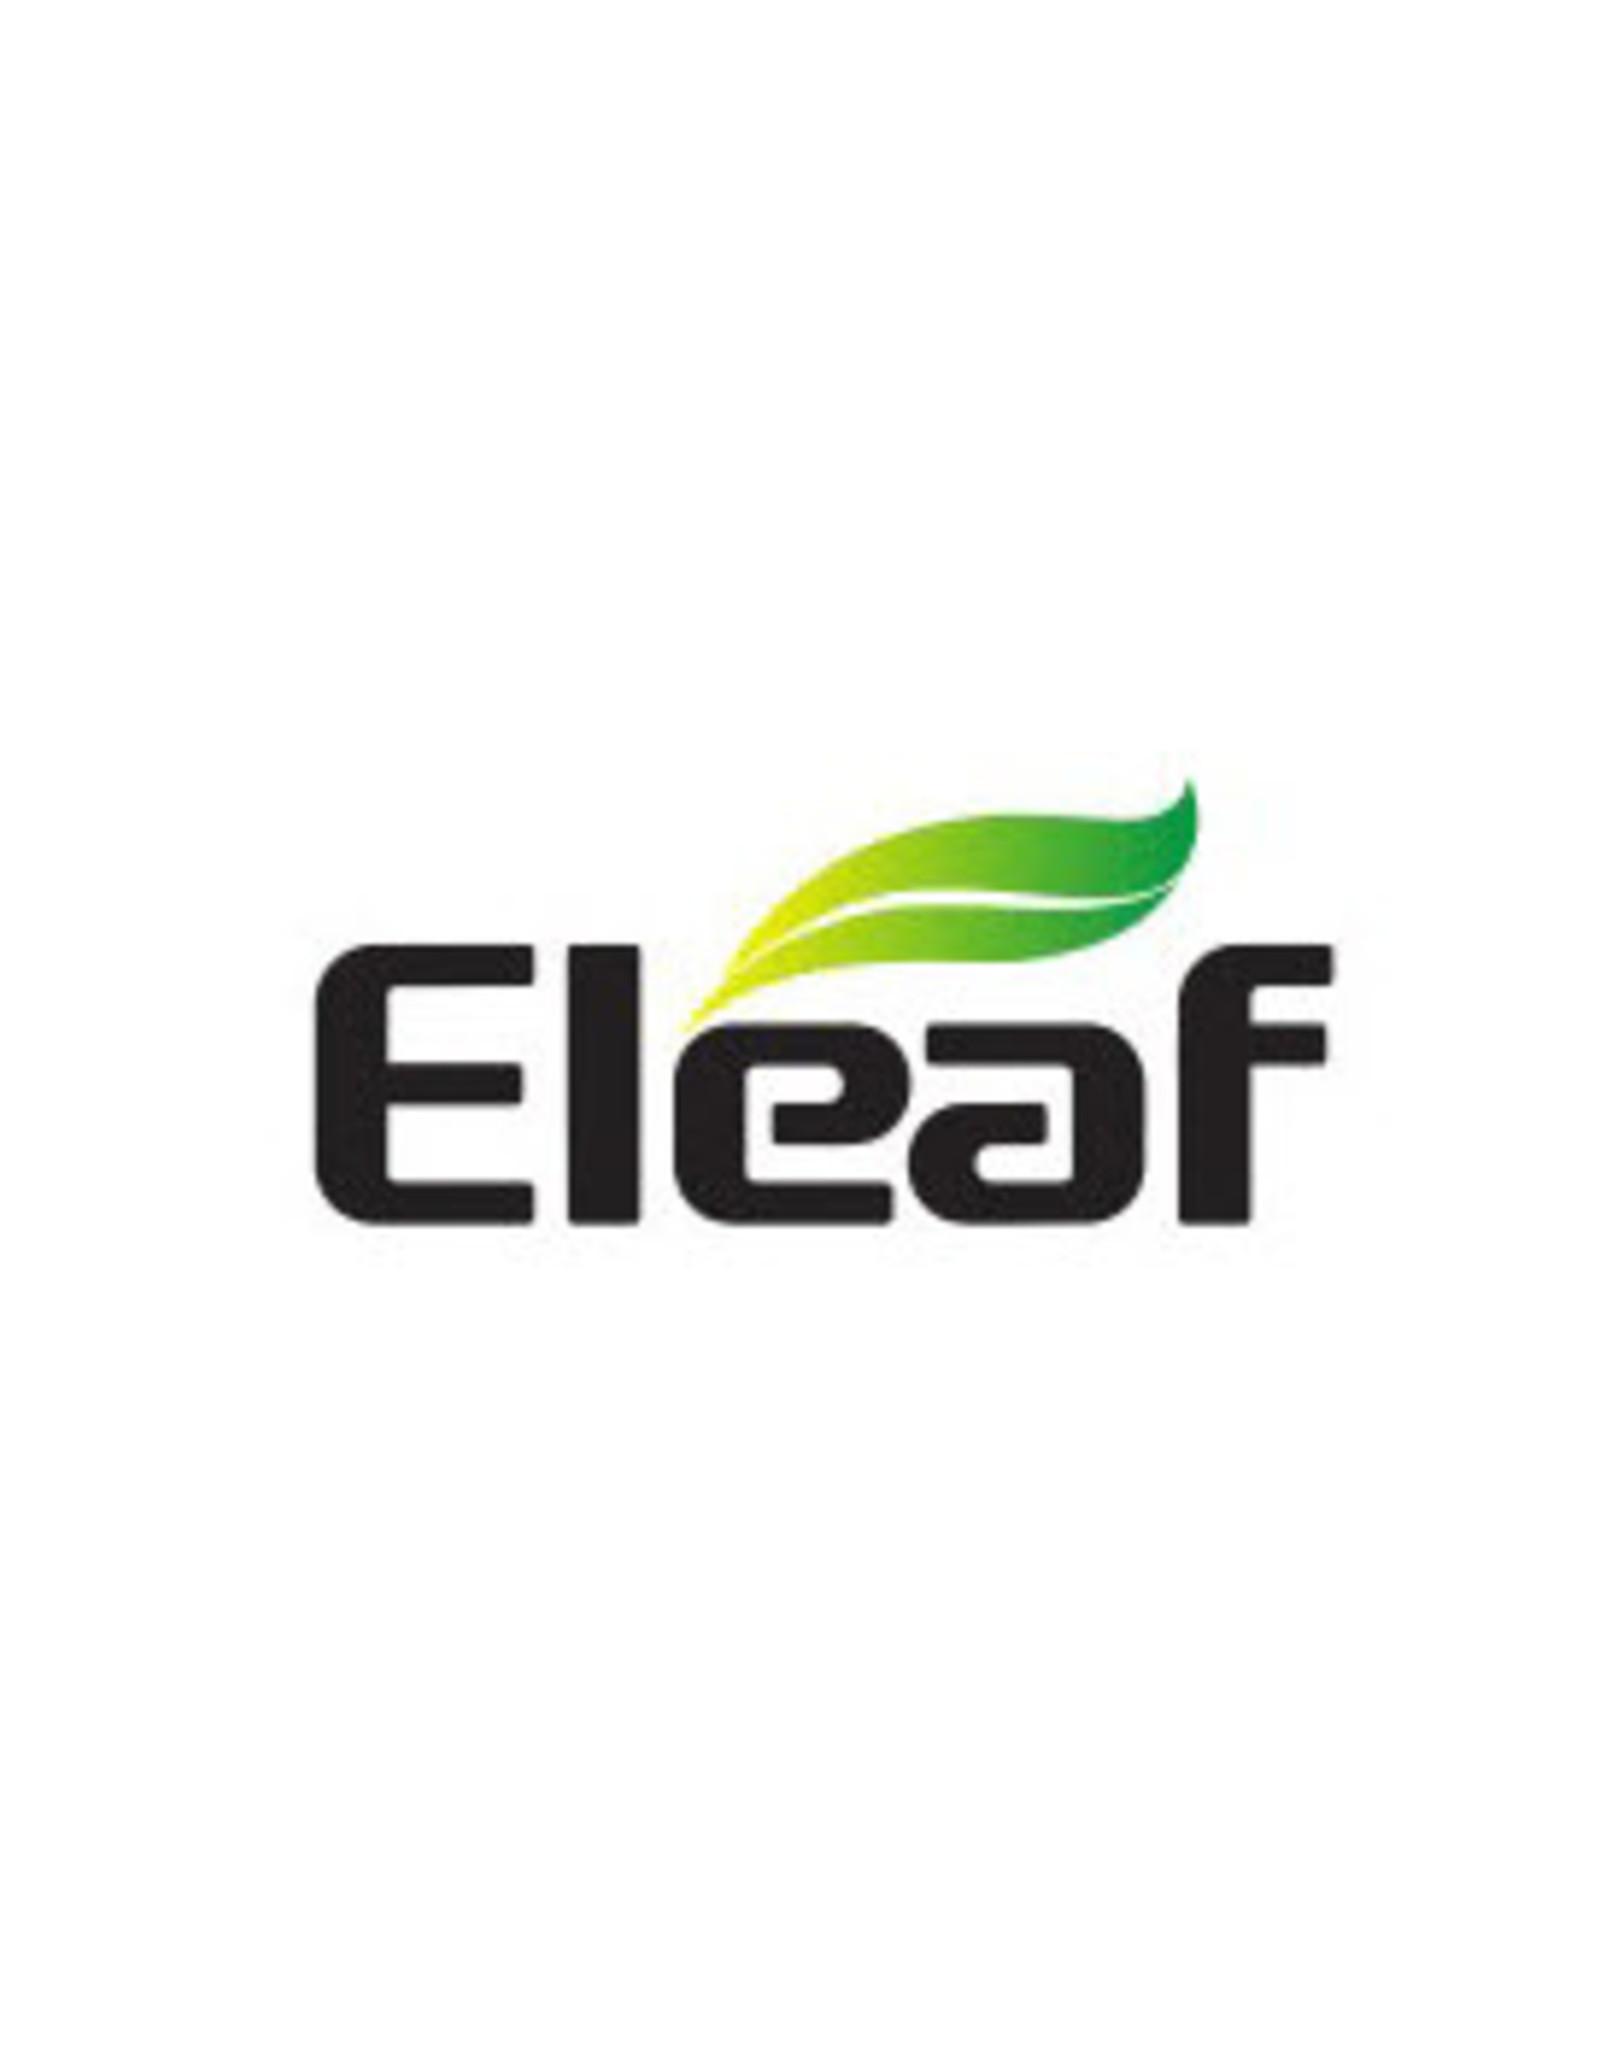 Eleaf ELEAF EC2 COILS (5 PACK)